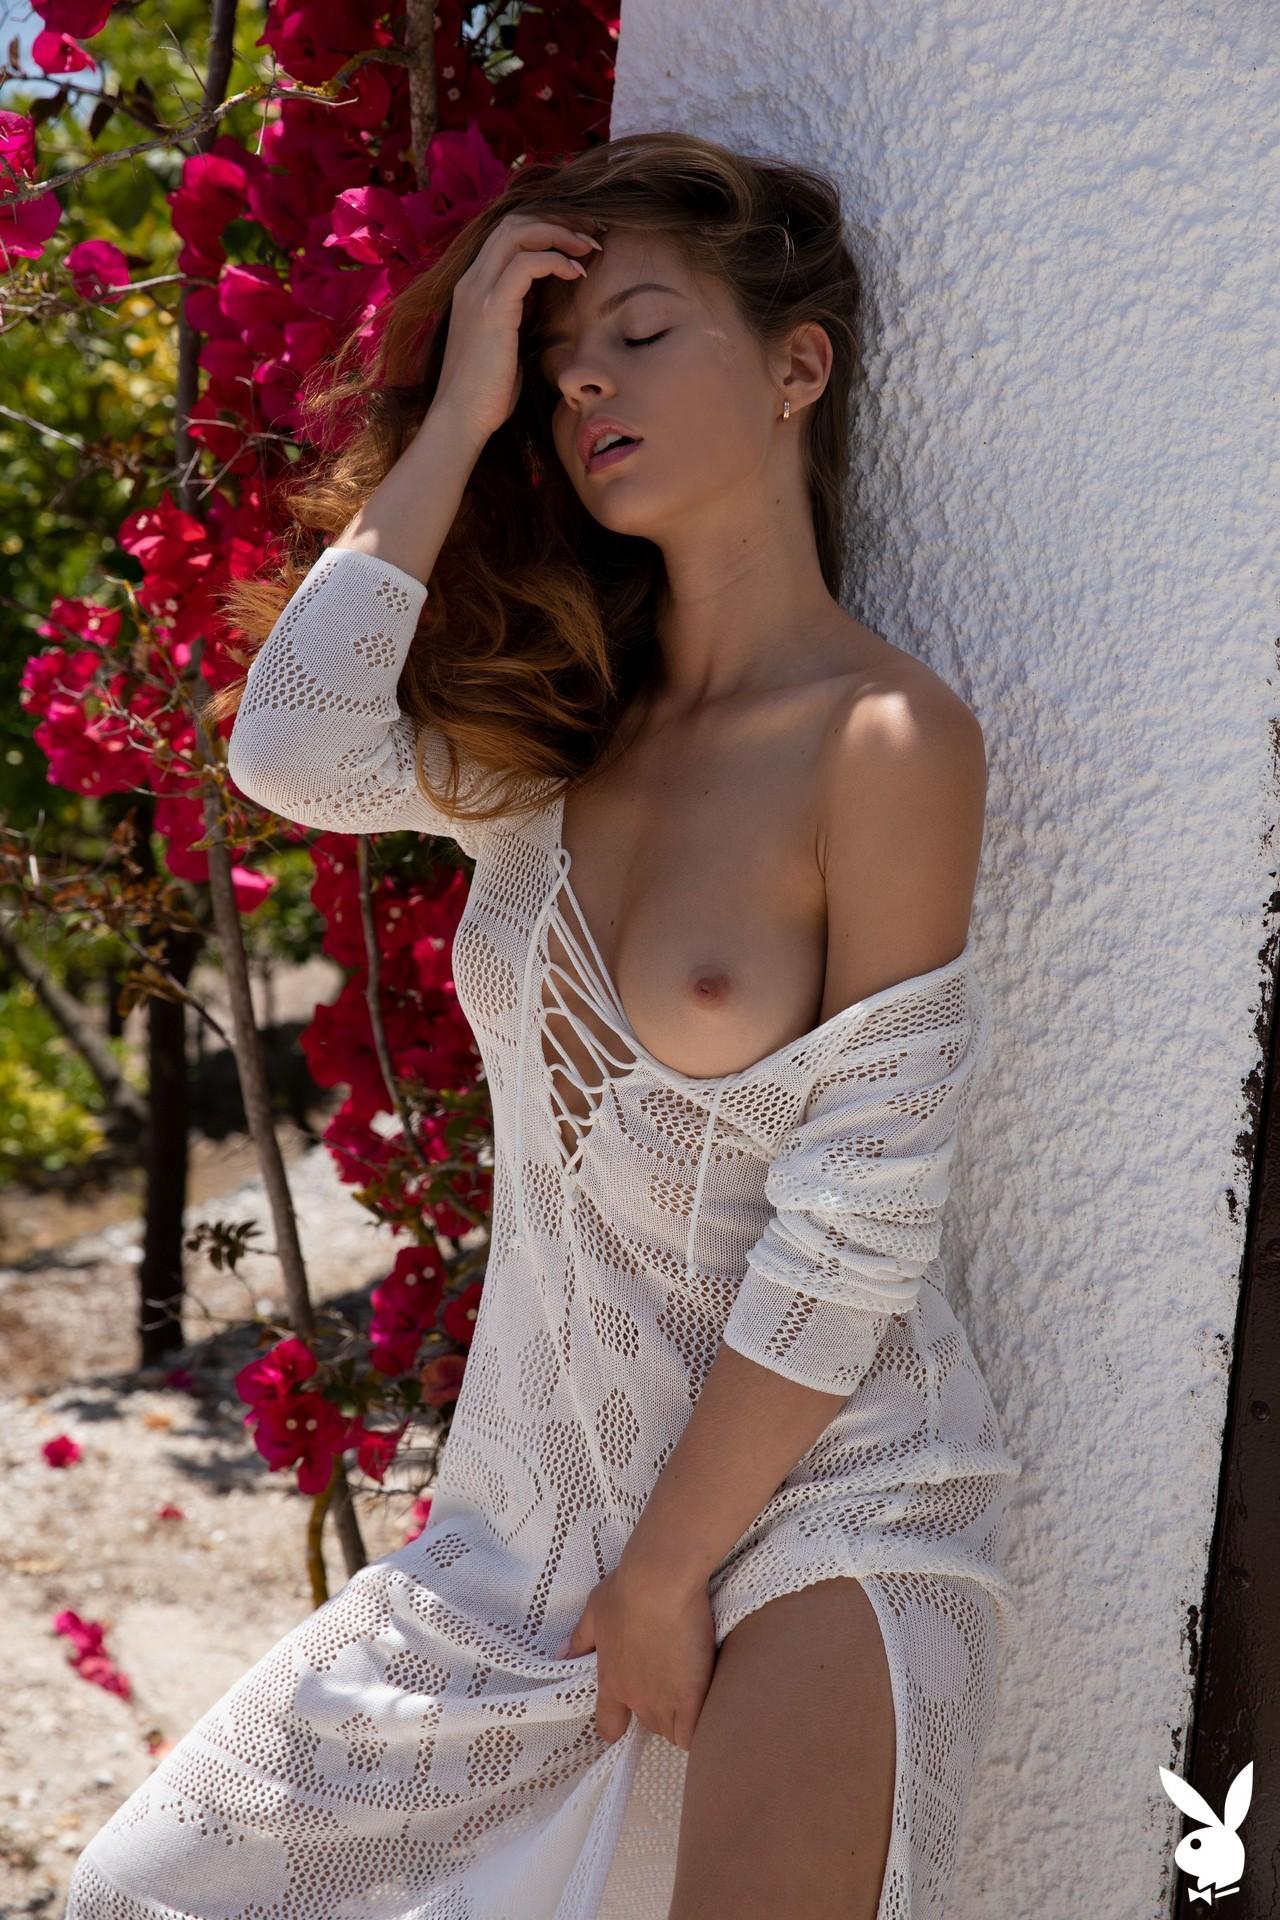 Julia Zu In Good Natured Playboy Plus (8)